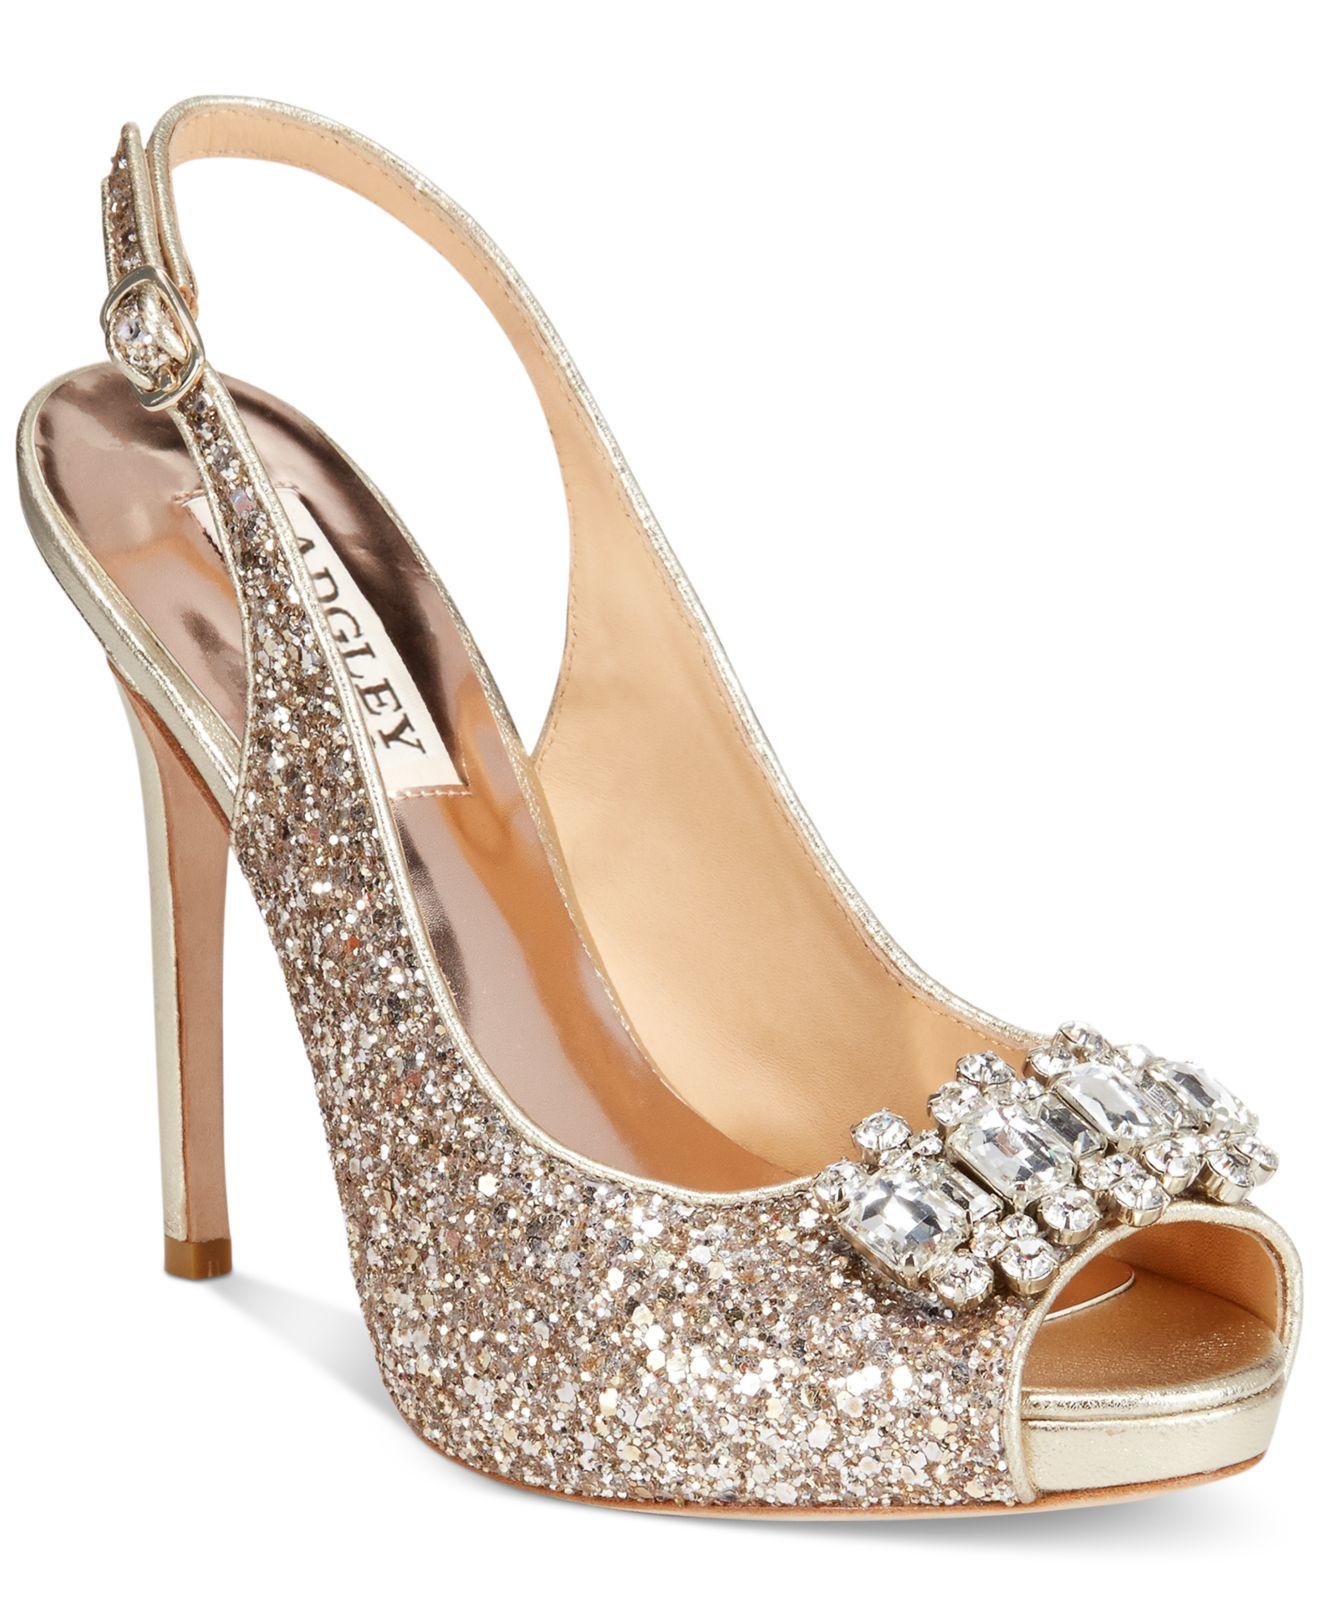 ab49d6e7576 Lyst - Badgley Mischka Adore Evening Sandals in Metallic